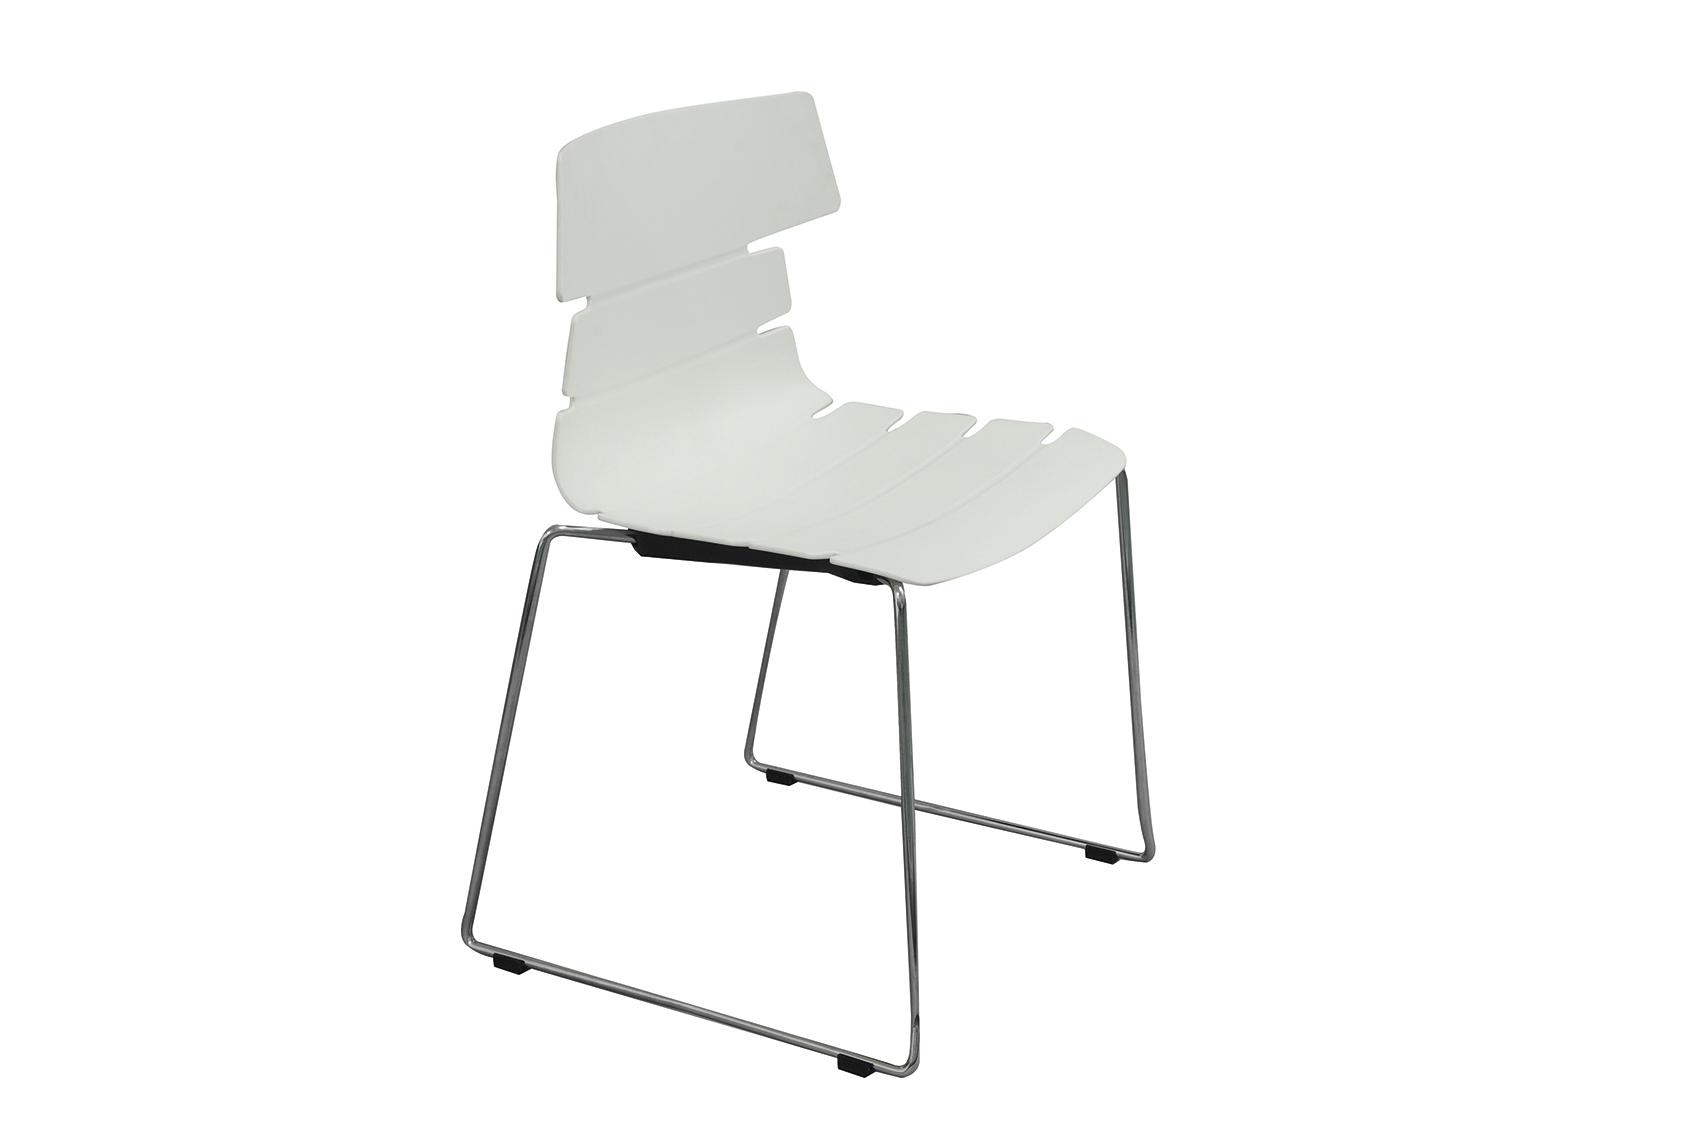 Europe Style Стул CT-605 белый europe style стол dt 903 белый